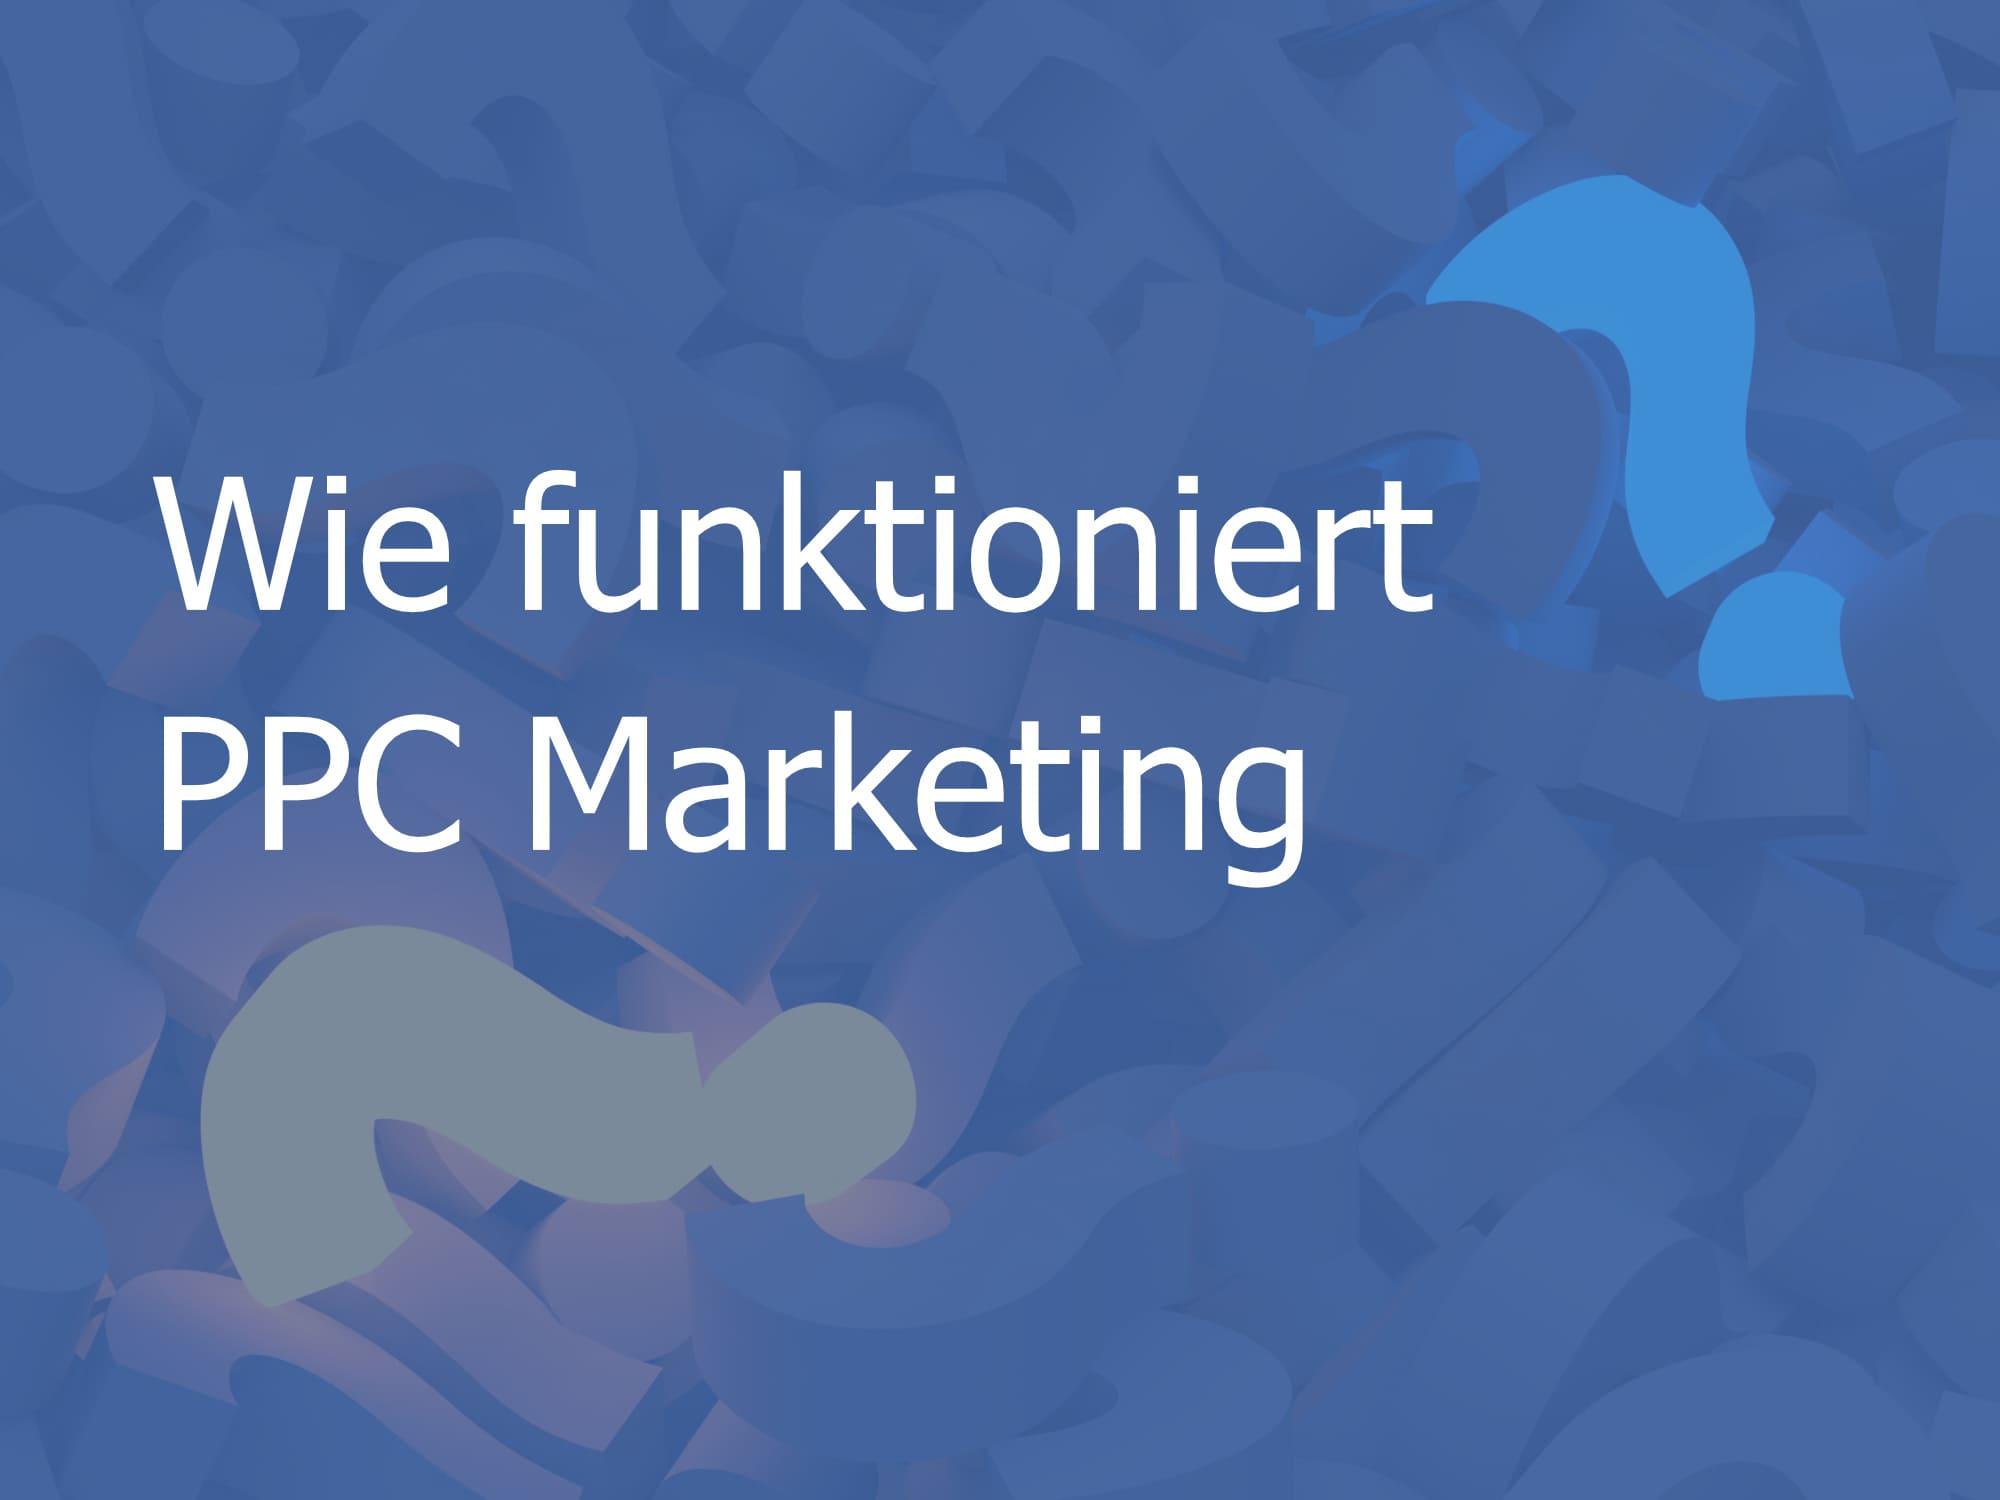 Wie funktioniert PPC Marketing